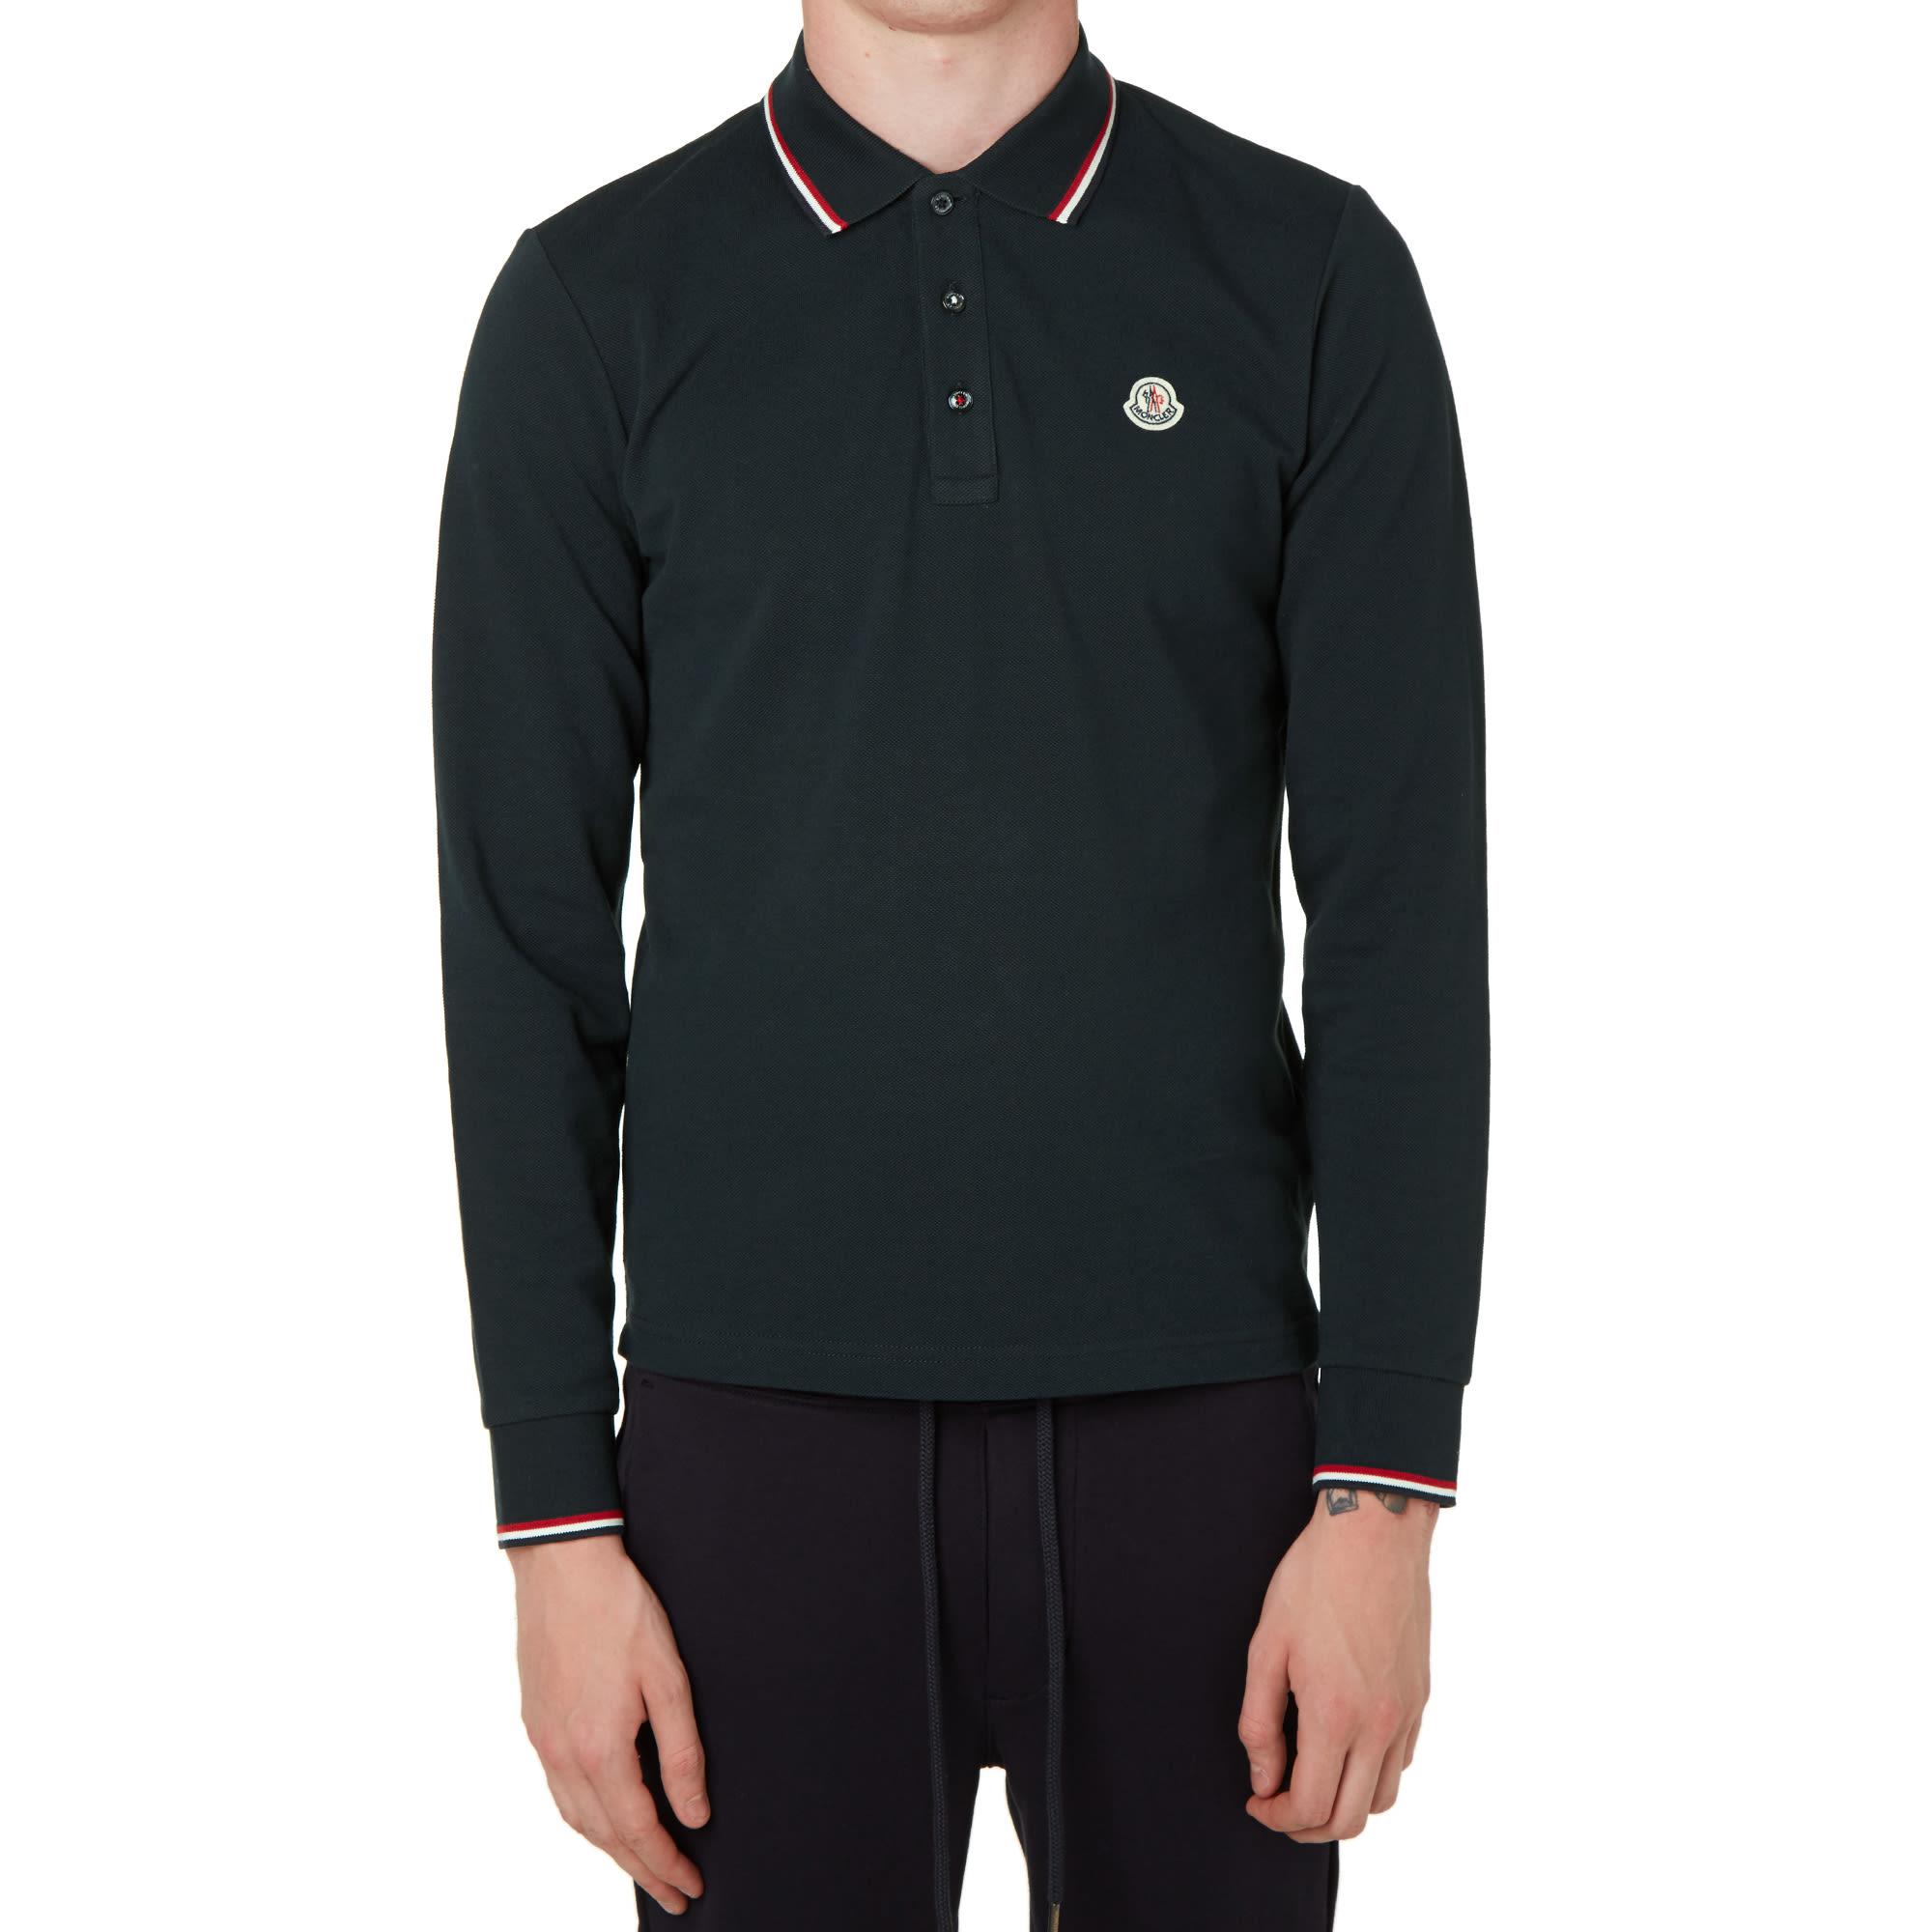 8b2b6ccd5 Moncler Long Sleeve Slim Fit Pique Polo